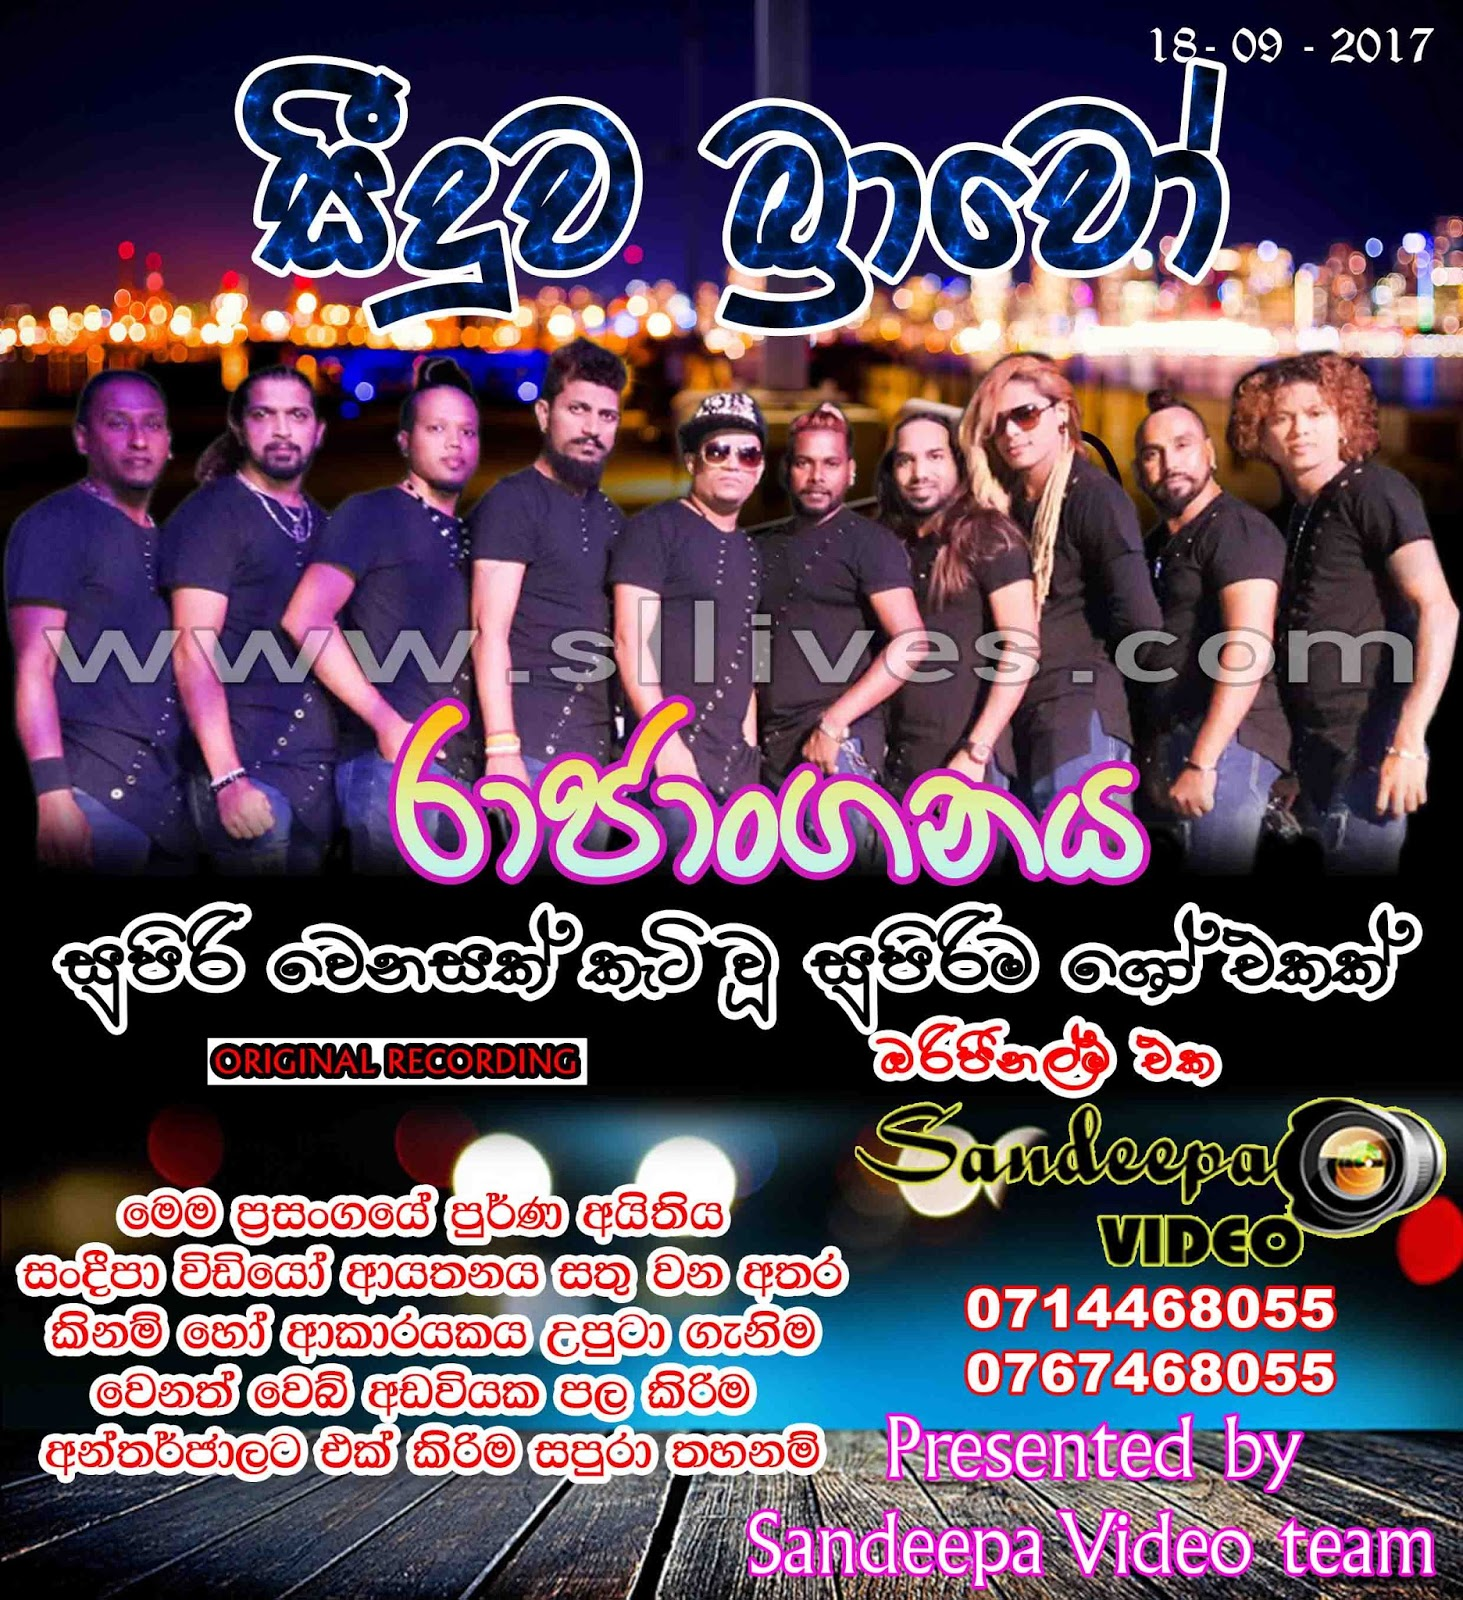 Nena Jage Hai Mp3: SEEDUWA BRAVO LIVE IN RAJANGANAYA 2017-09-18